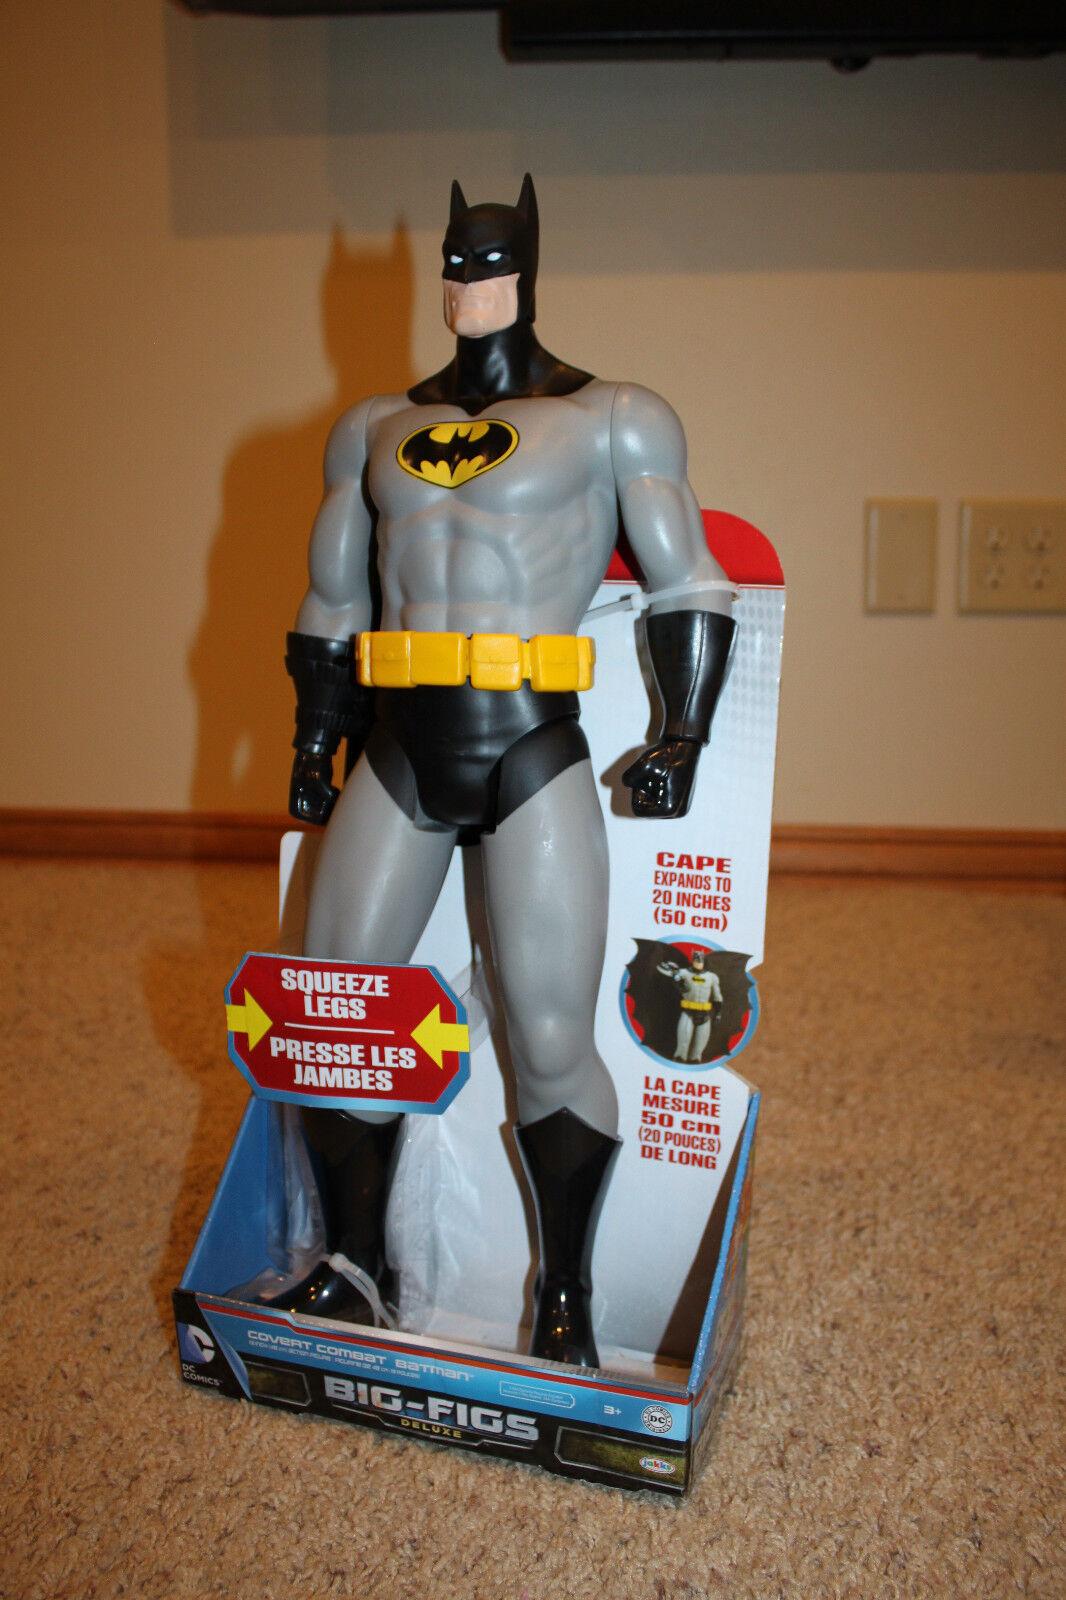 NEW-  DC Comics Deluxe Big Figs Action Figure Toy 19  - Cogreen Combat Batman